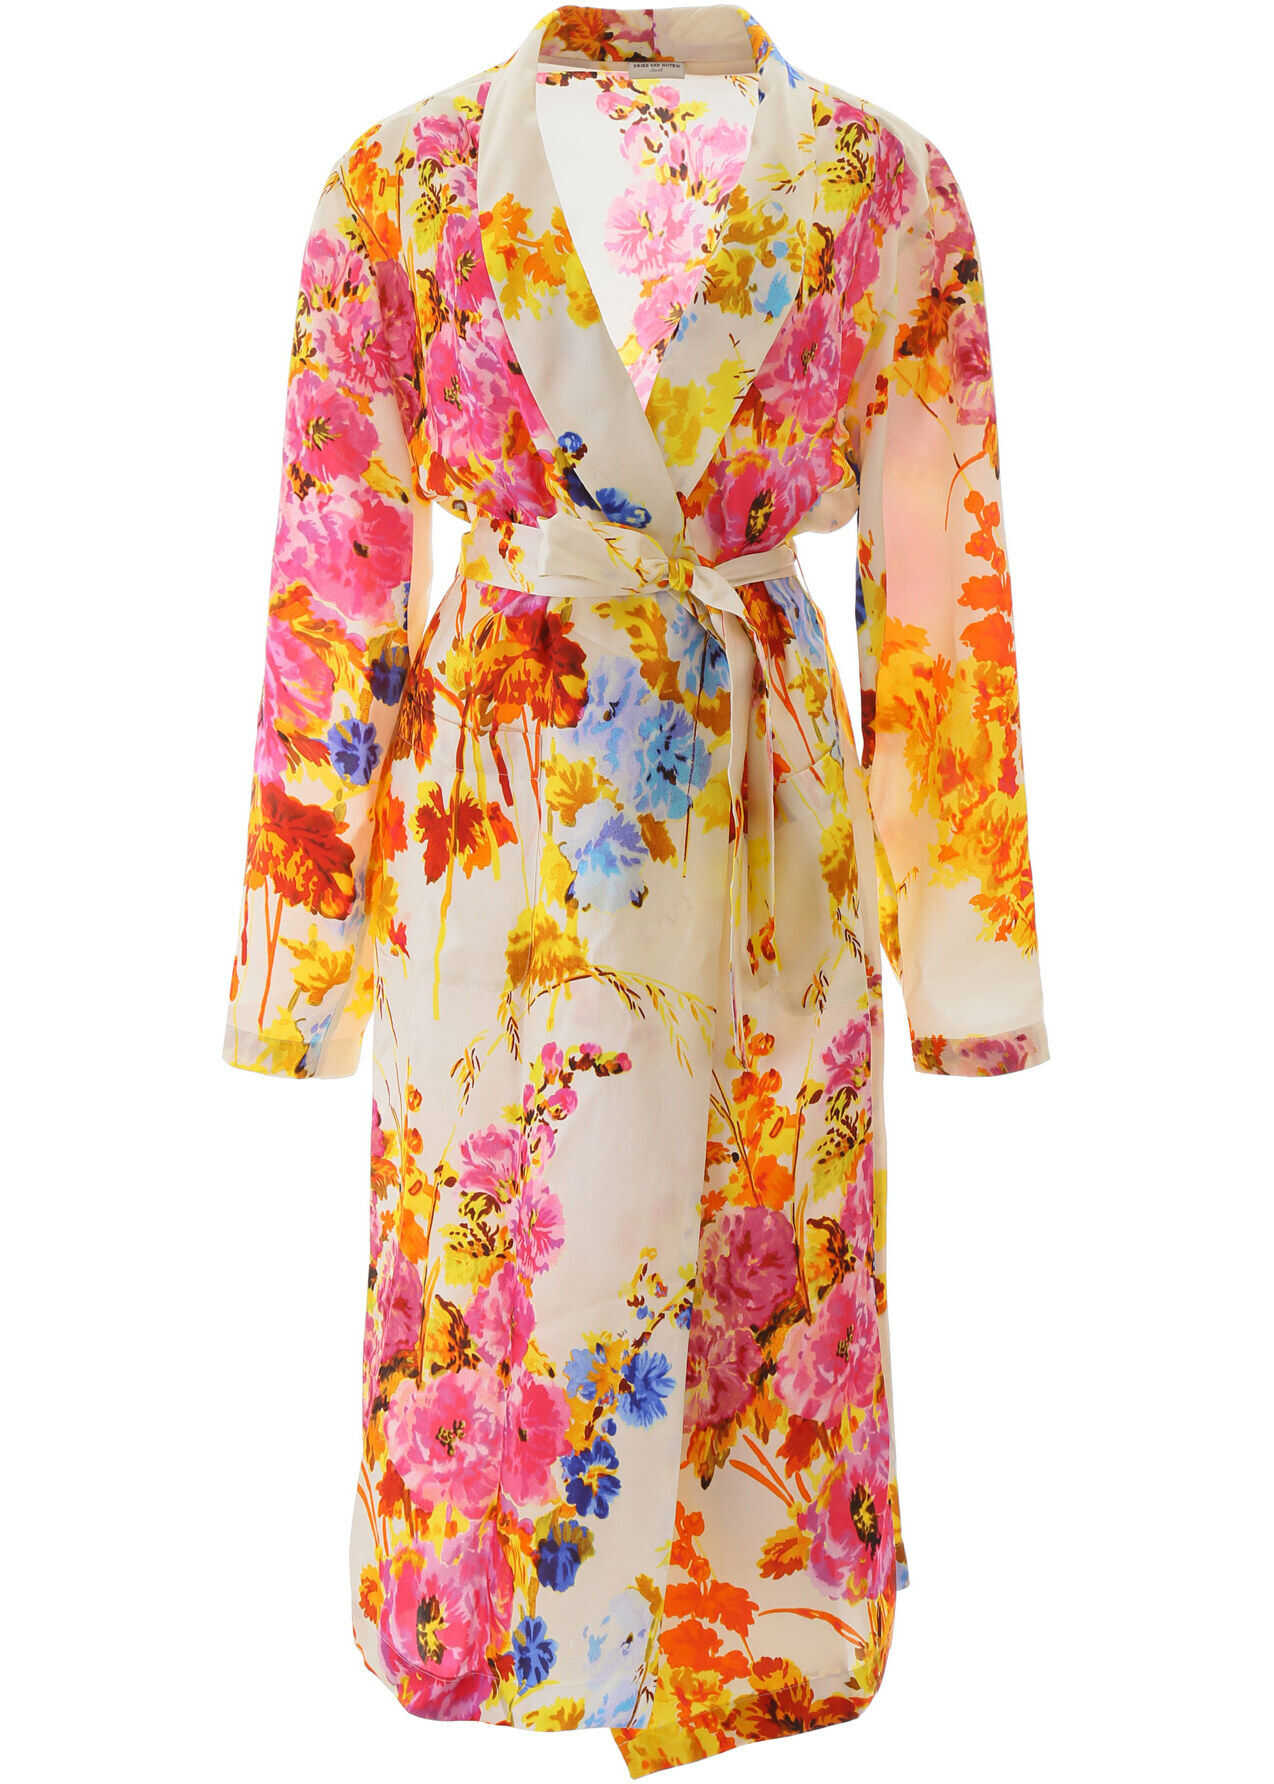 Dries Van Noten Charly Floral Dress ECRU